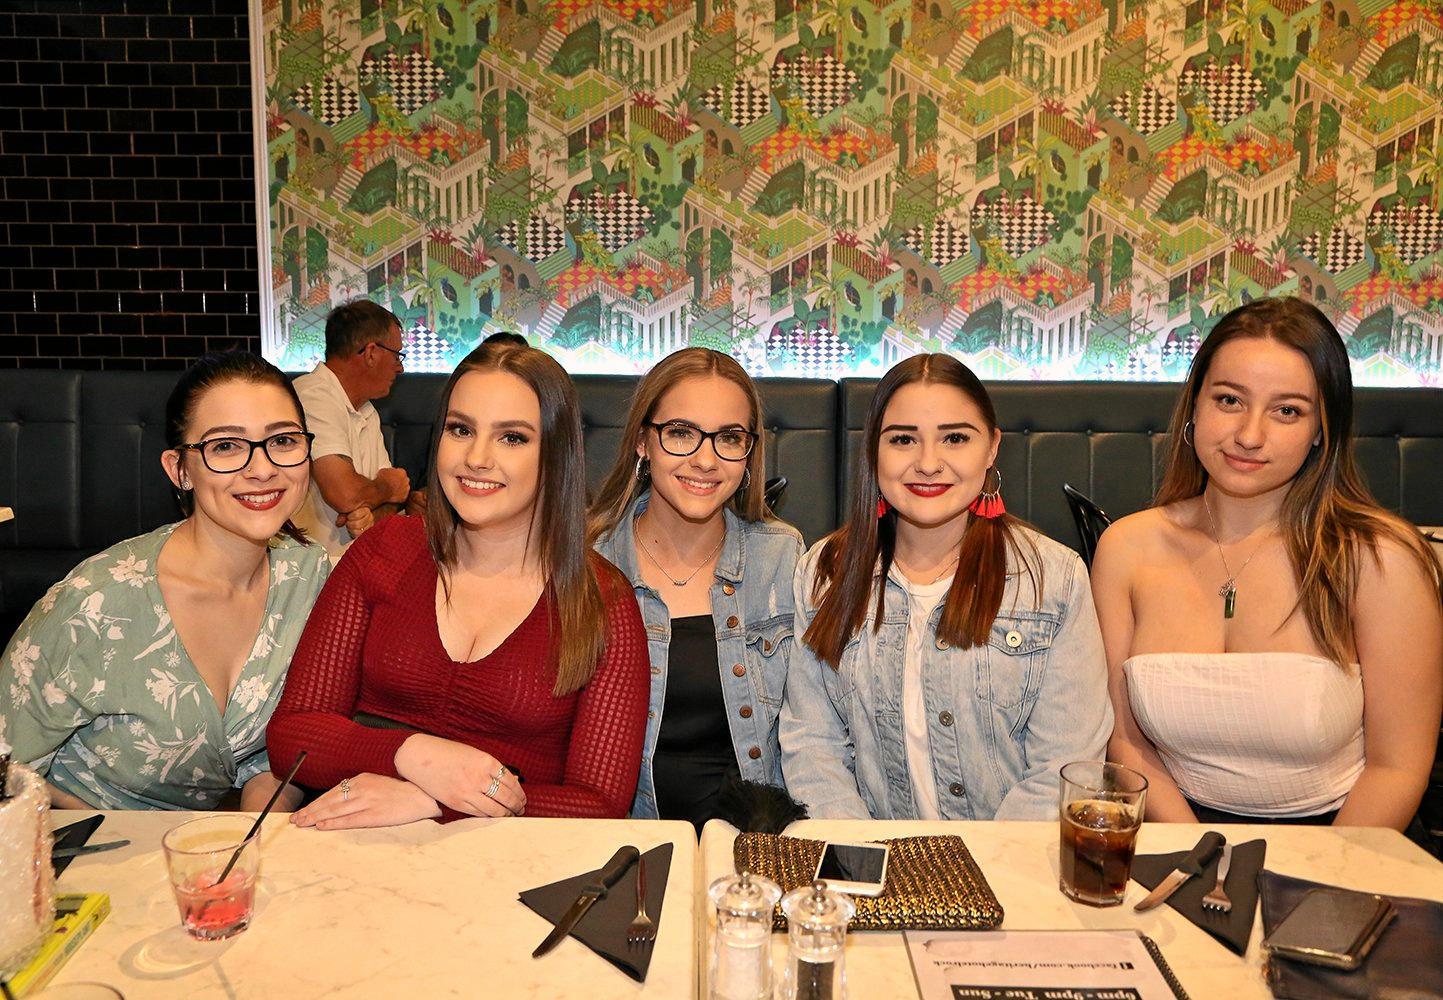 Brittany Barlow, Jocelyn Fletcher, Tia Richardson, Maddison Barlow and Issy Woo at The Heritage Hotel.